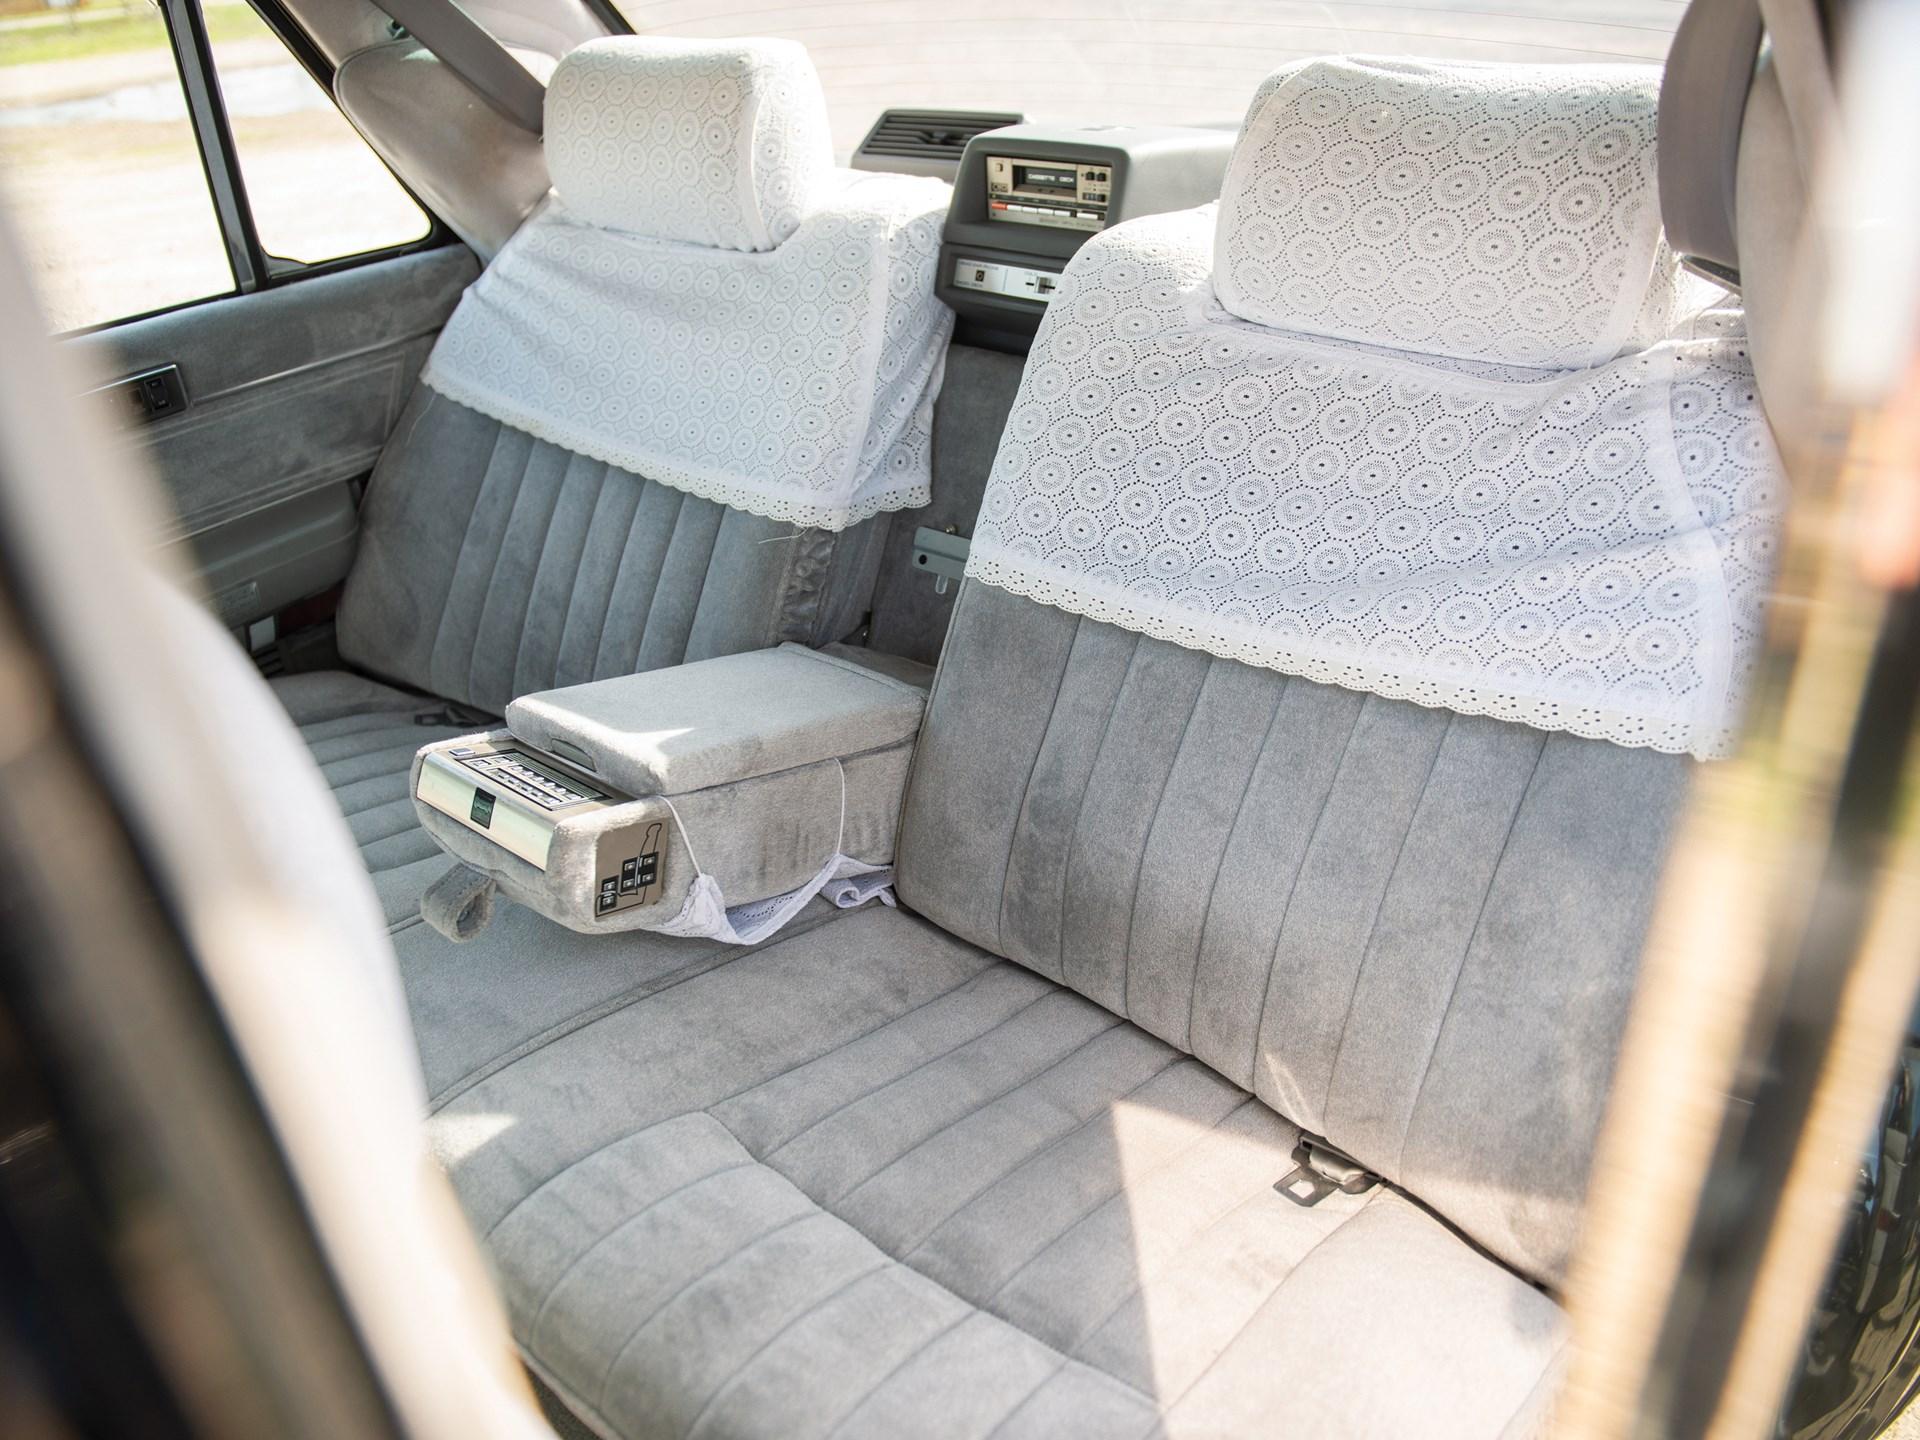 1987 Nissan President Sovereign V8E VIP rear seat covers